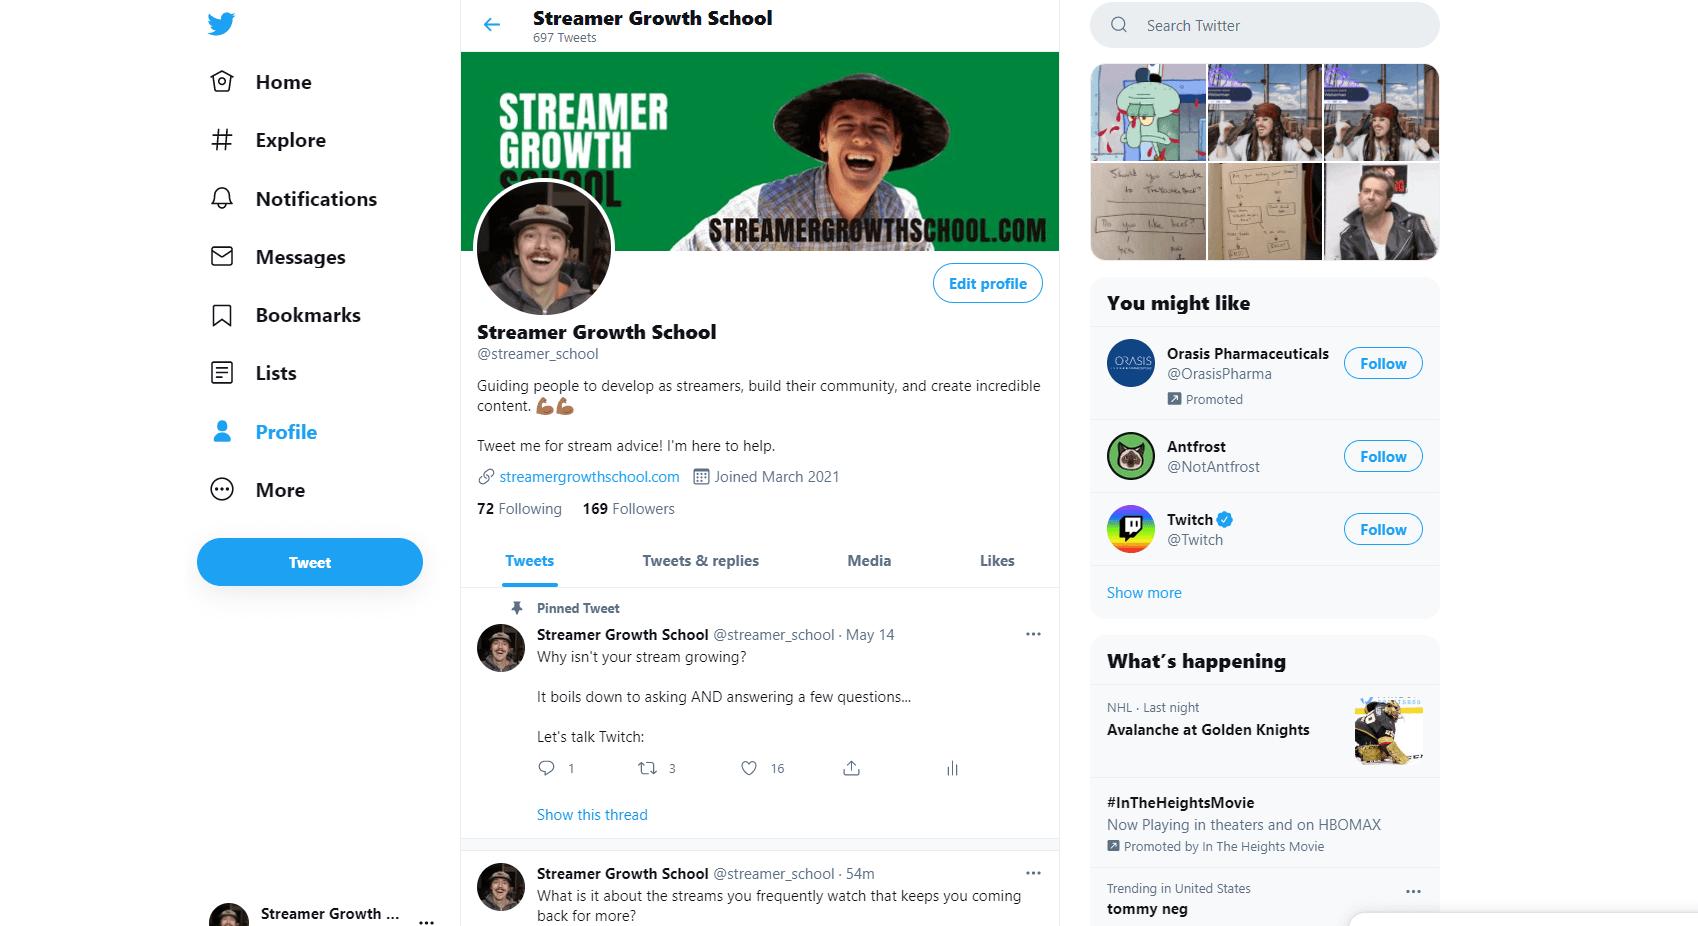 Streamer Growth School Twitter Page